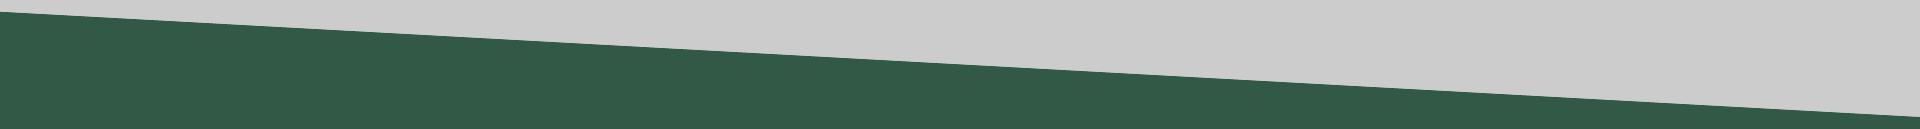 detalhe-layout-footer-frota